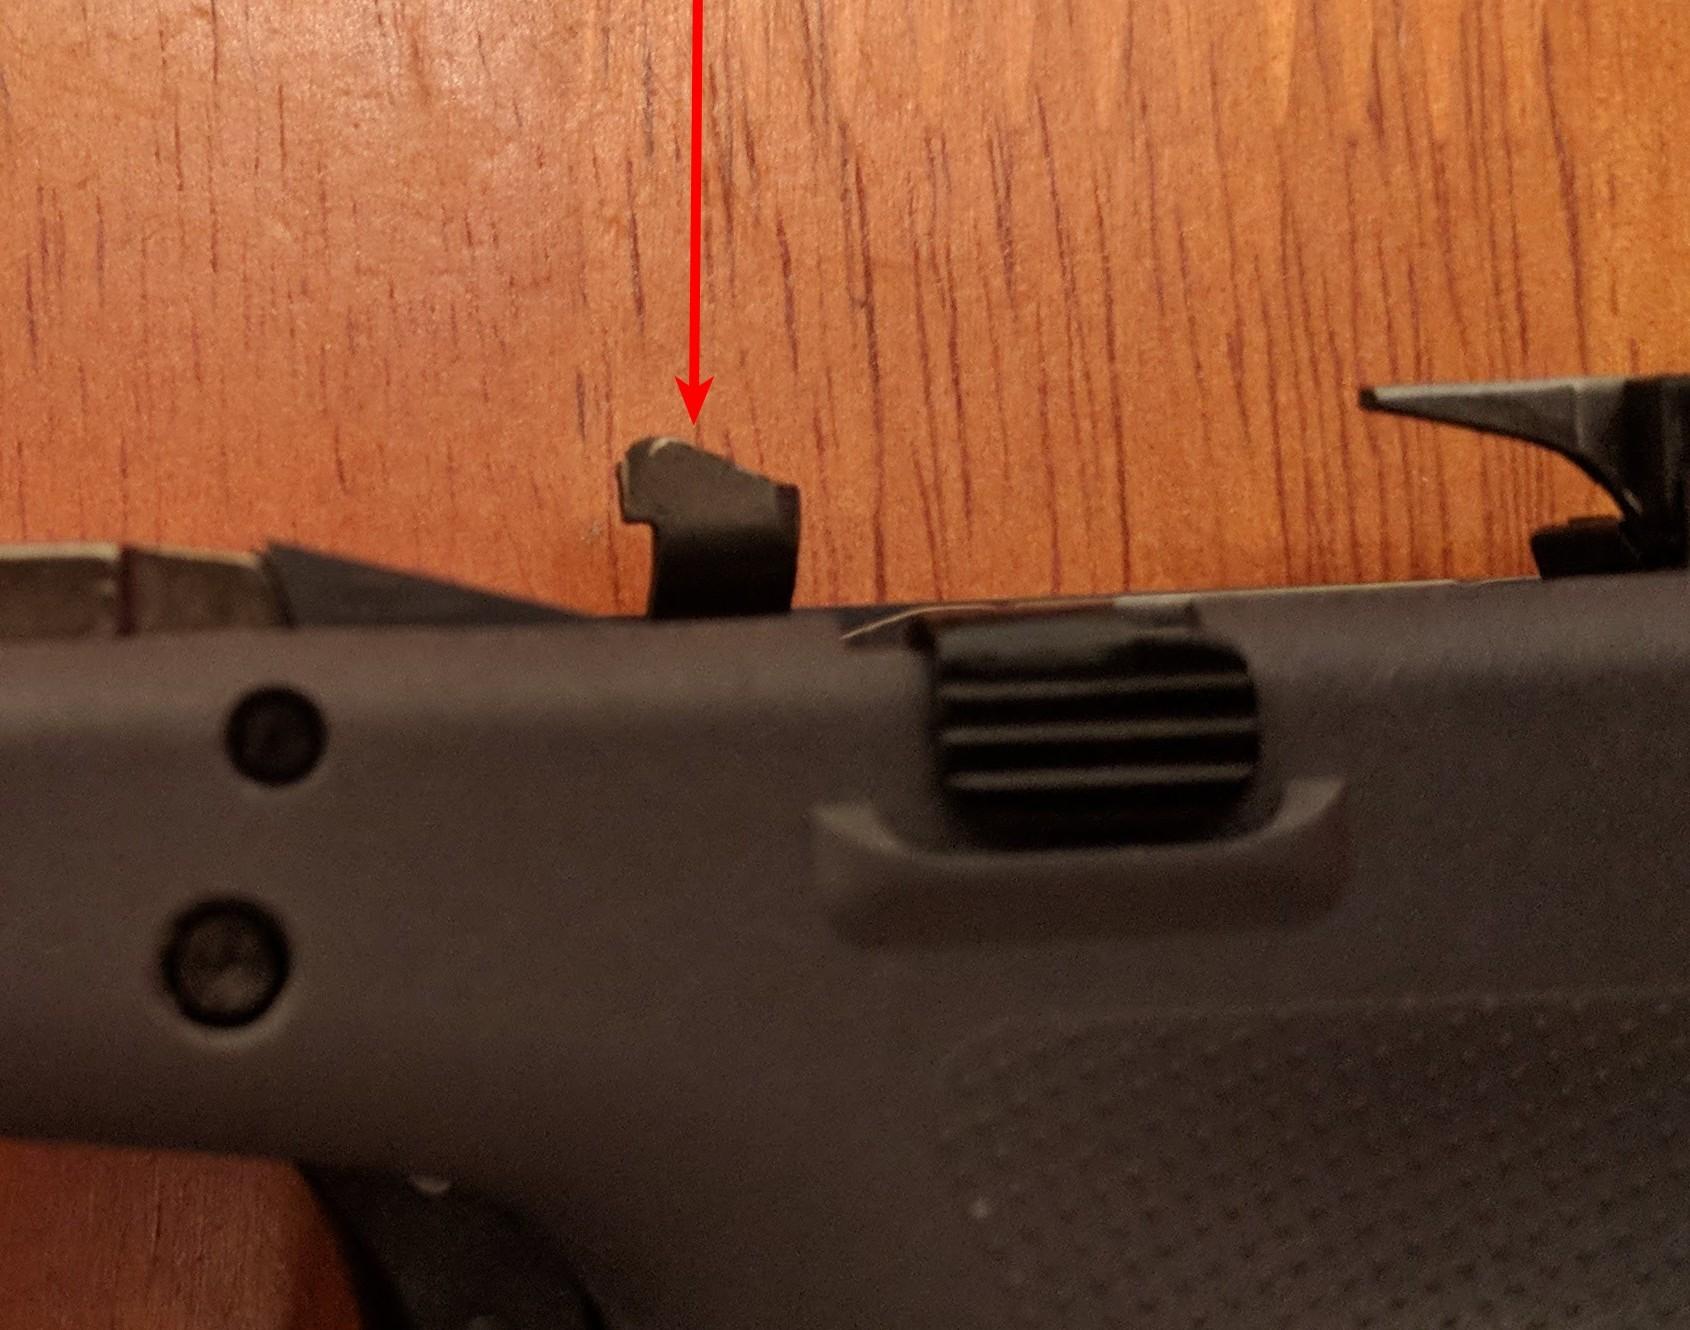 glock trigger bar tab